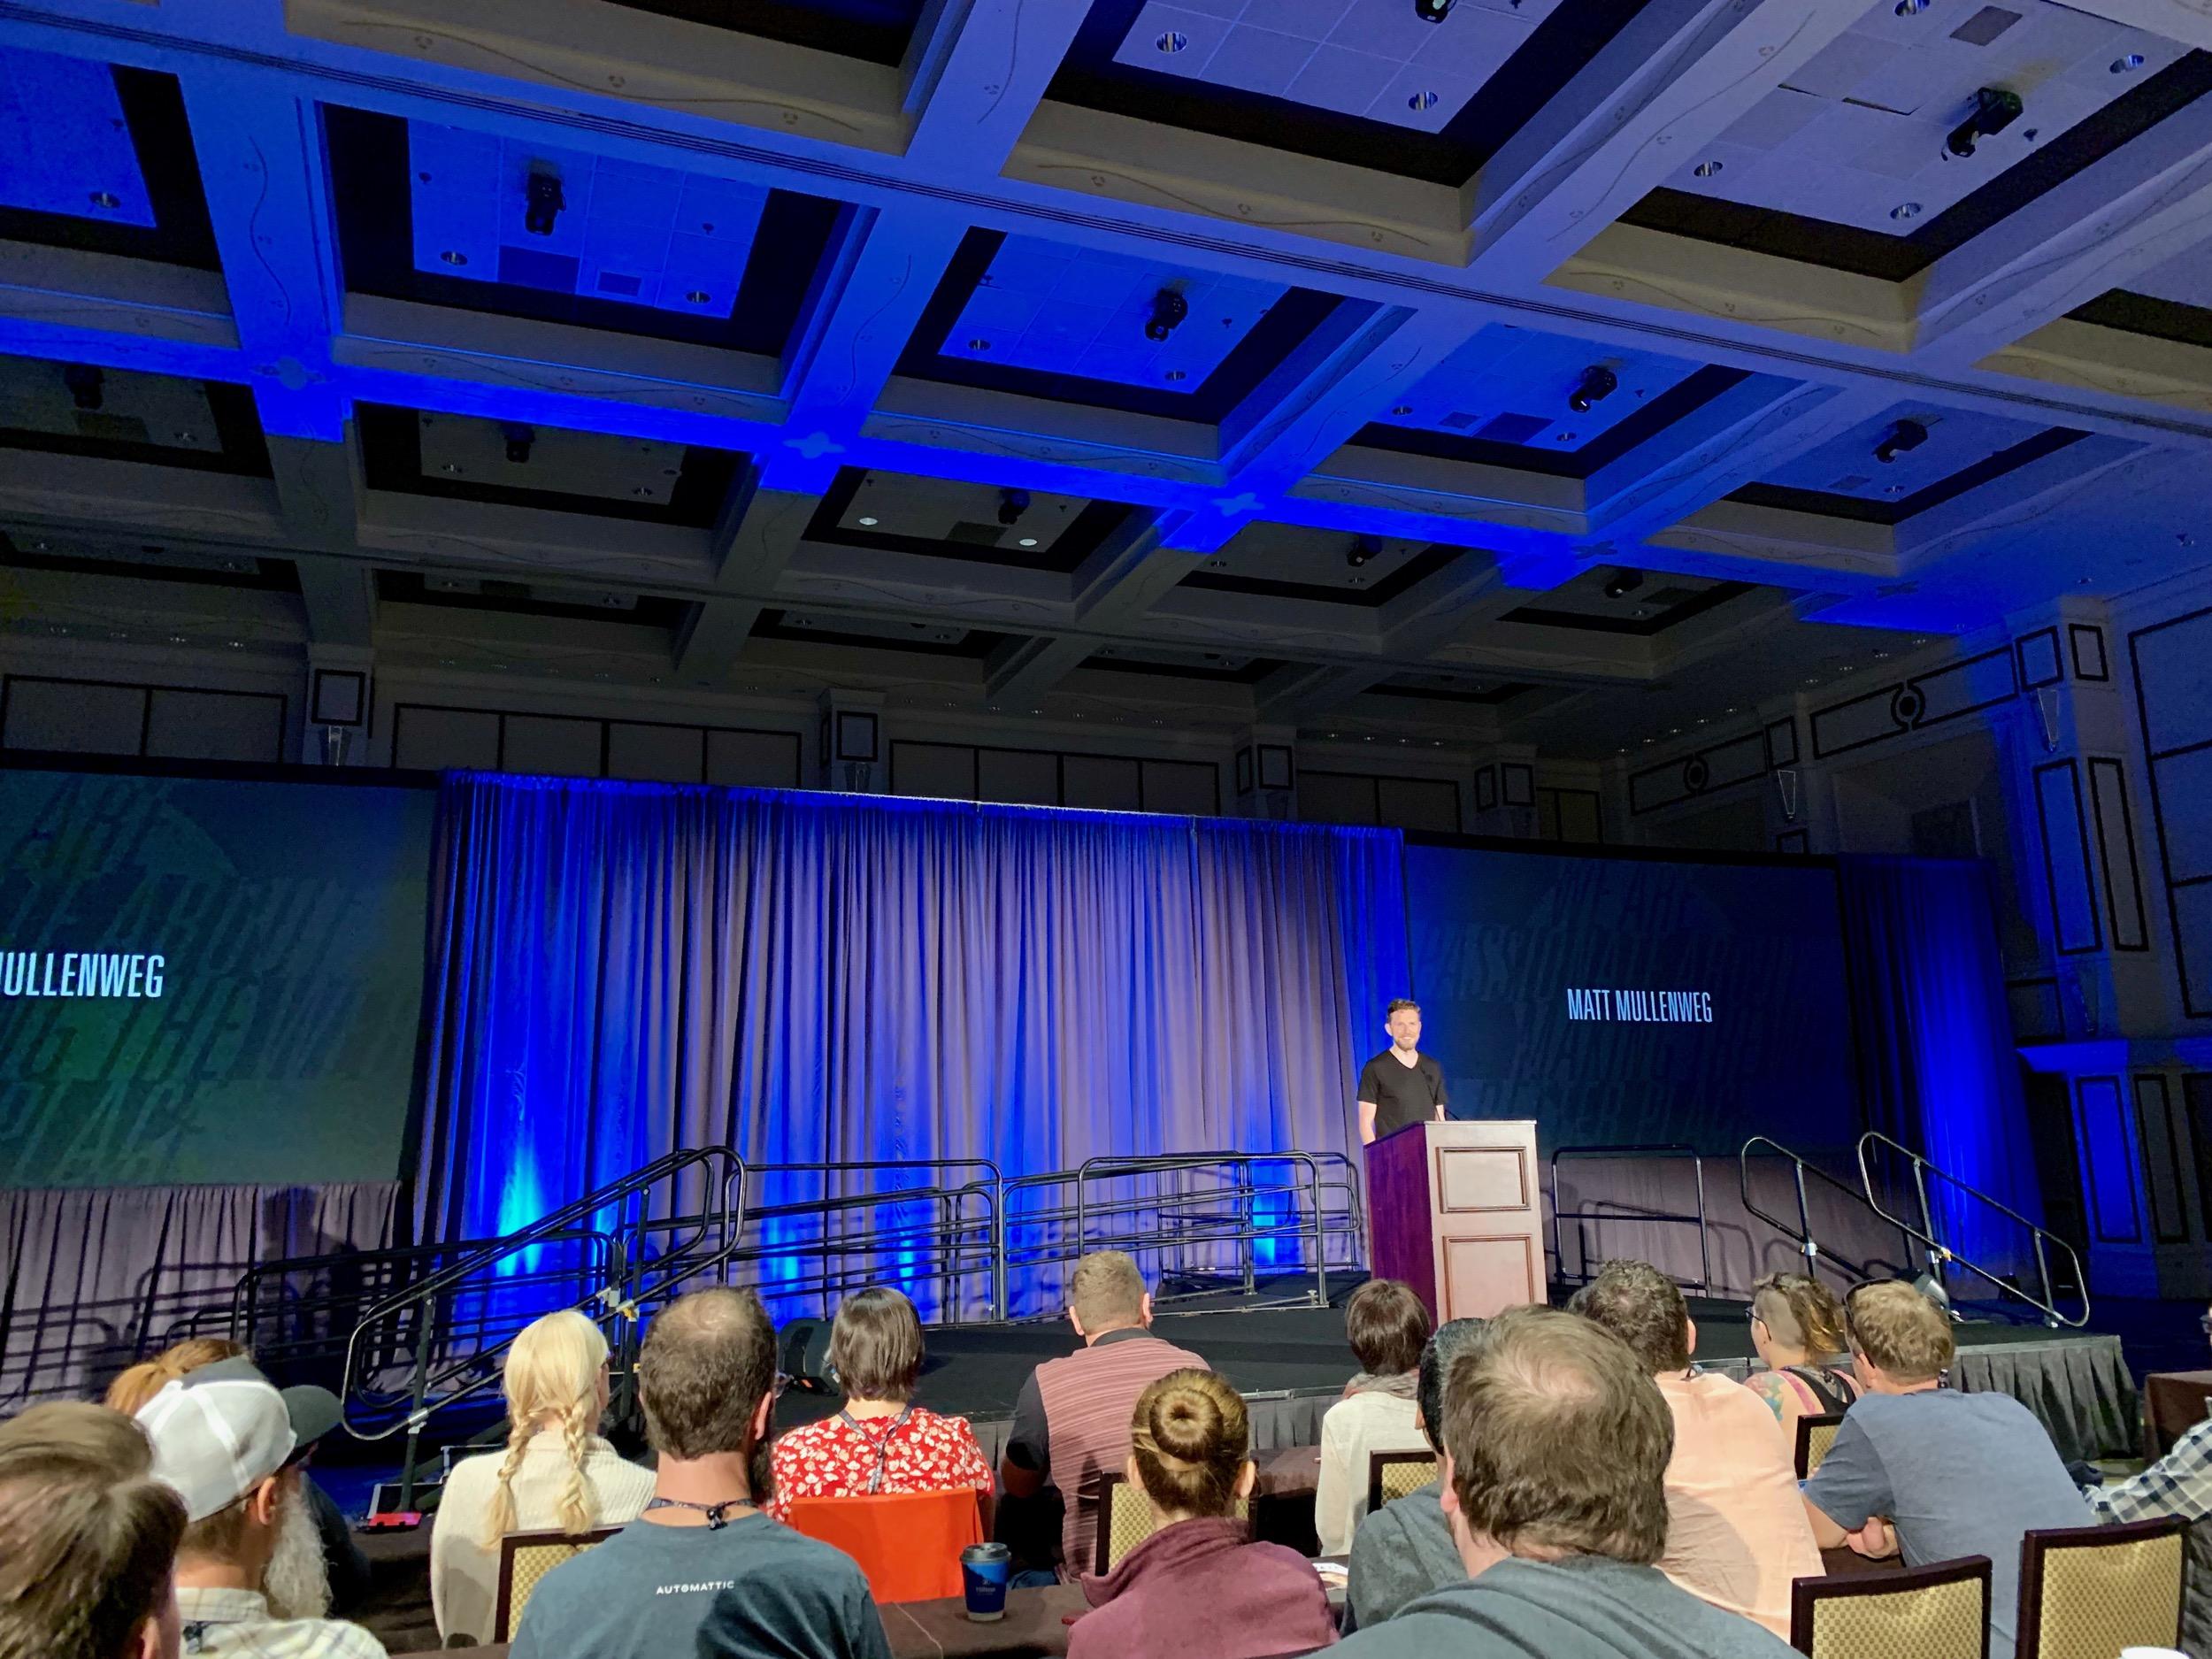 Grand Meetup 2019 Openning Remarks